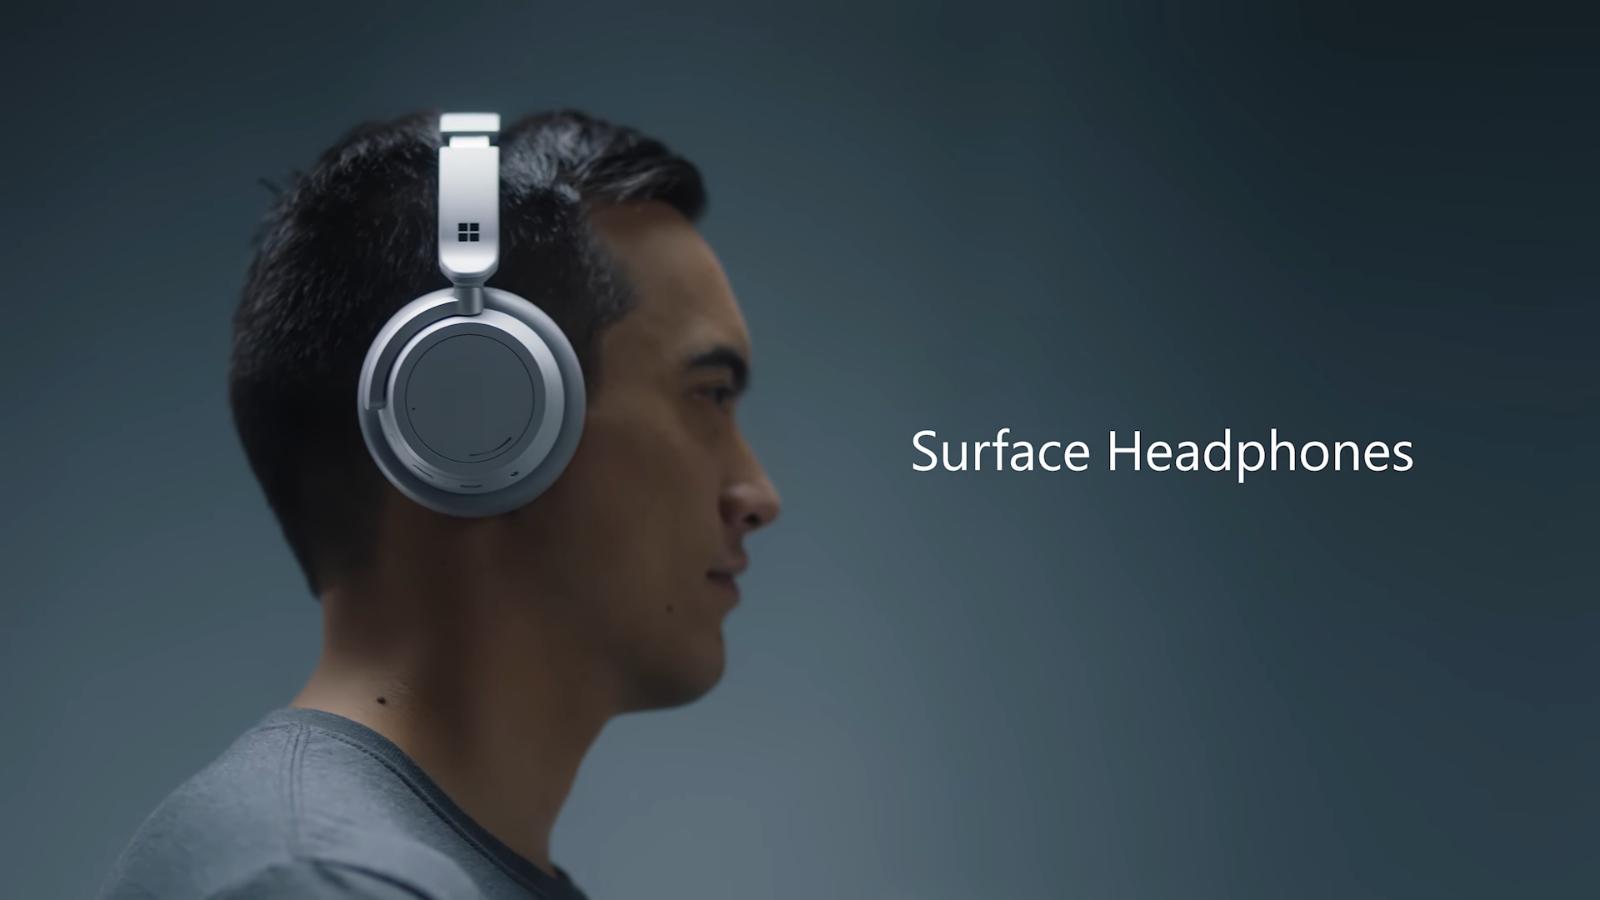 Surface性能飙升 微软新品发布会重点都有啥